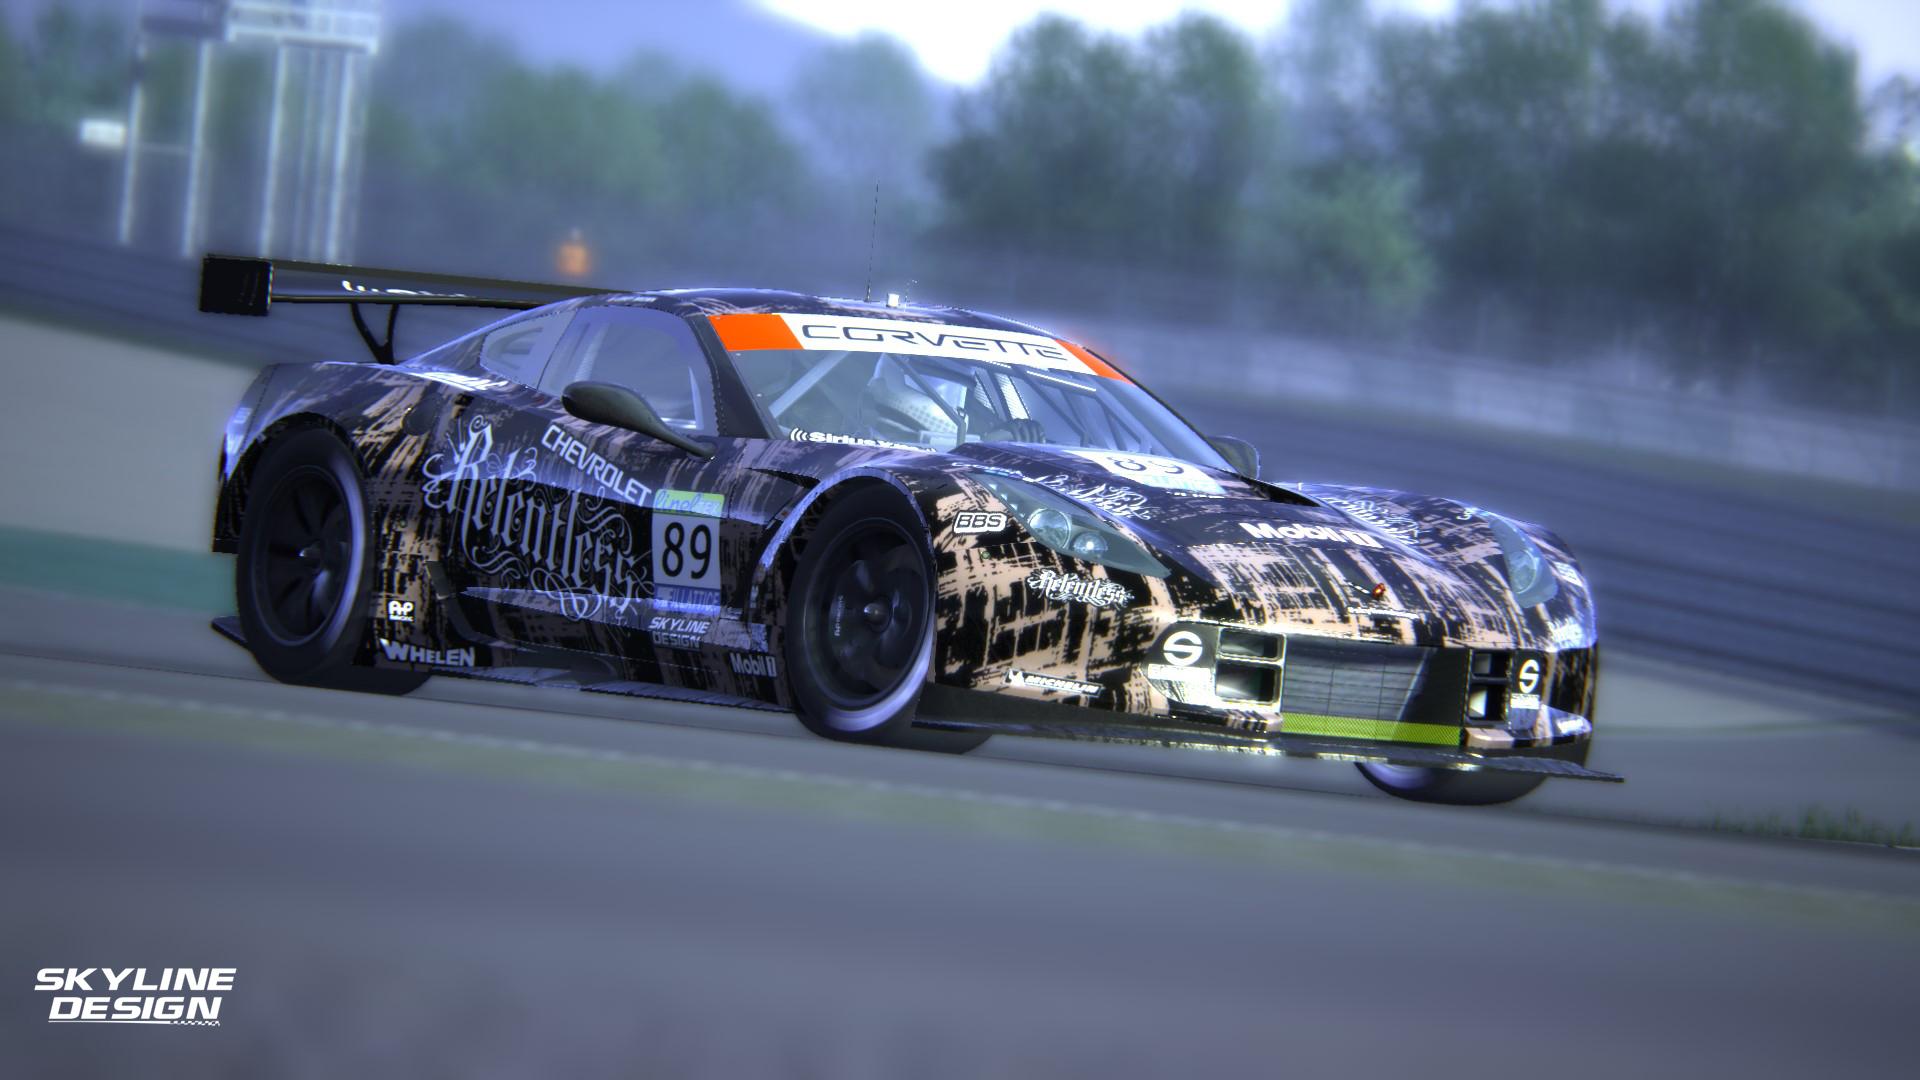 Screenshot_ks_corvette_c7r_nurburgring-sprint_30-8-115-14-56-27.jpg